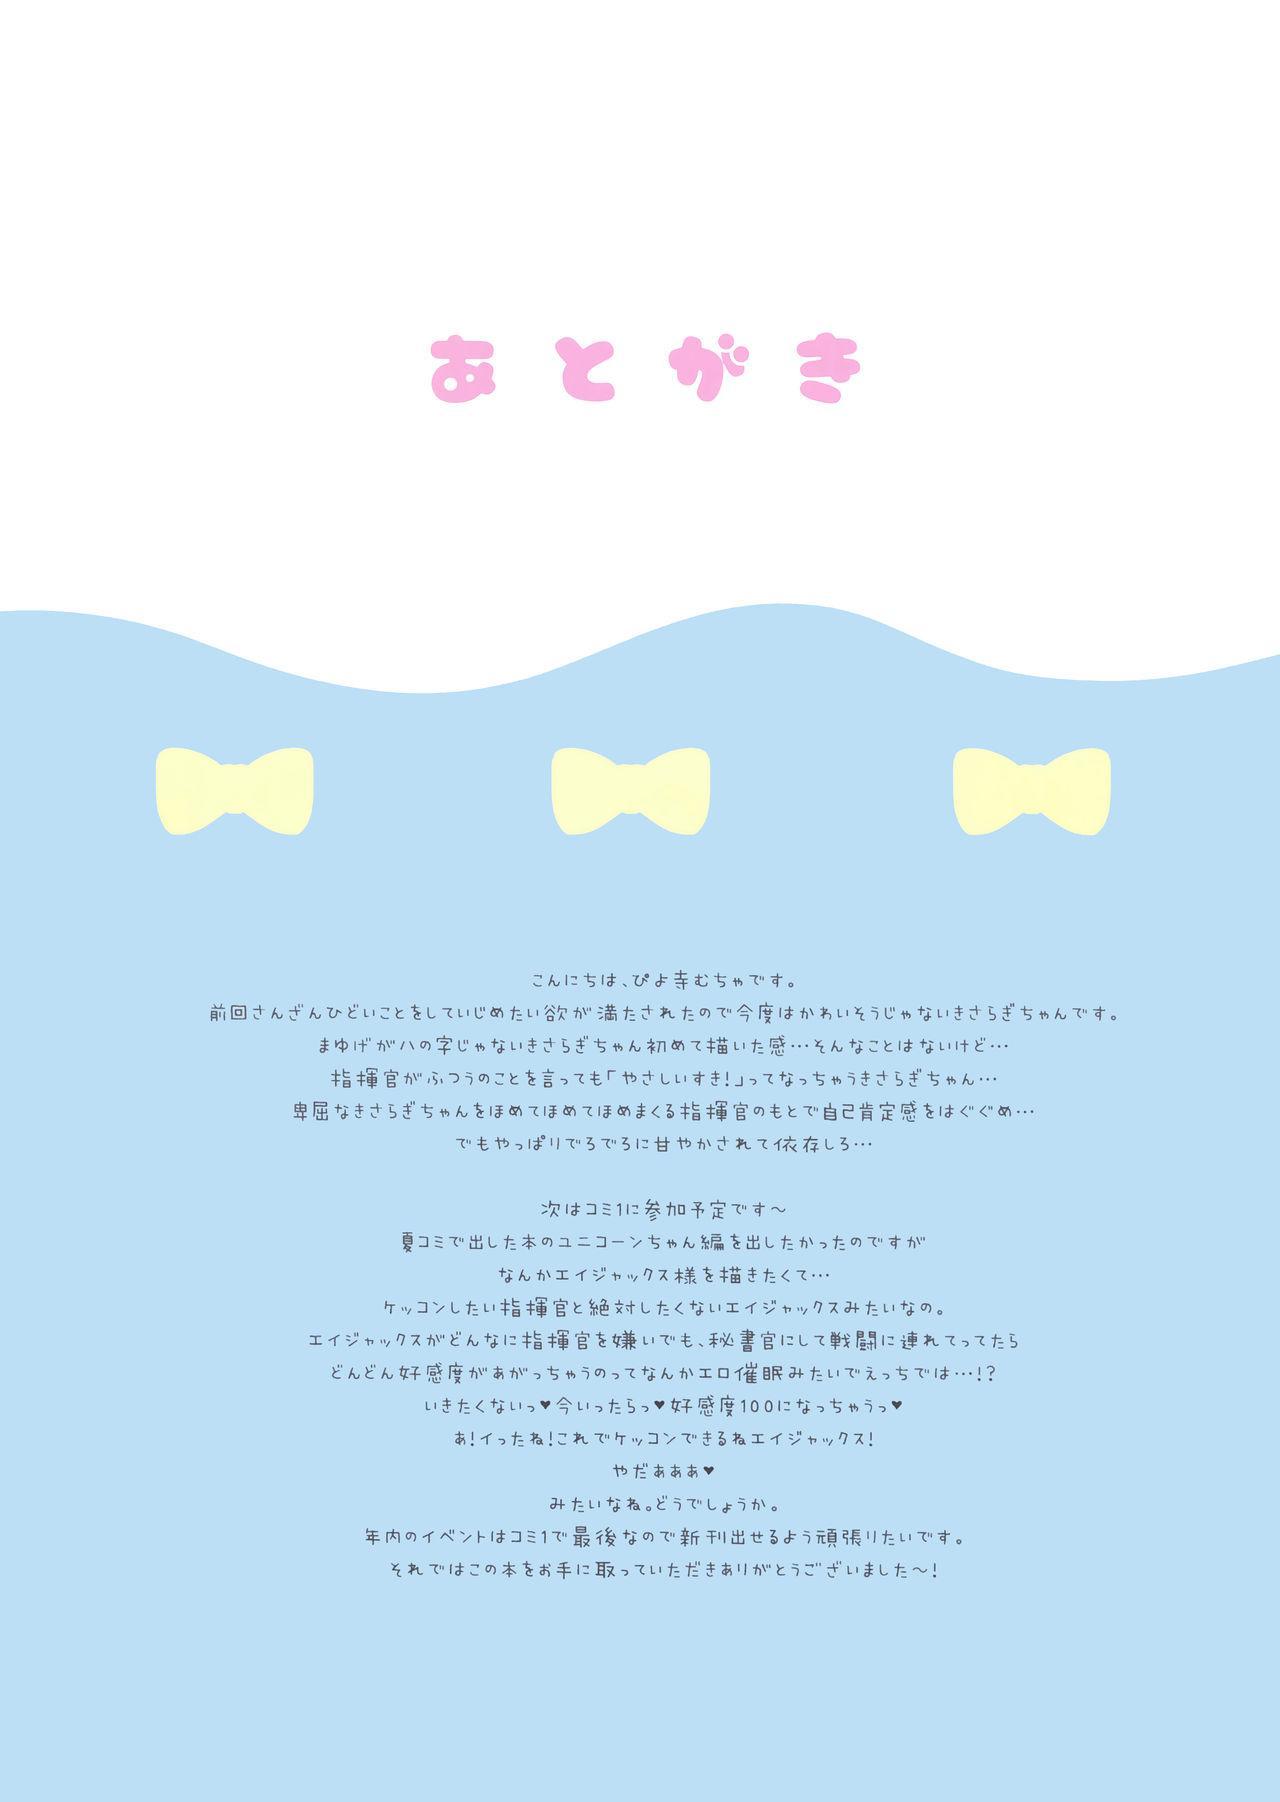 (Mimiket 40) [PiyoPit (Piyodera Mucha)] Kisaragi-chan wa Kawaisou ja Nai! - Kisaragi-chan is not pitiful! (Azur Lane) [English] 14